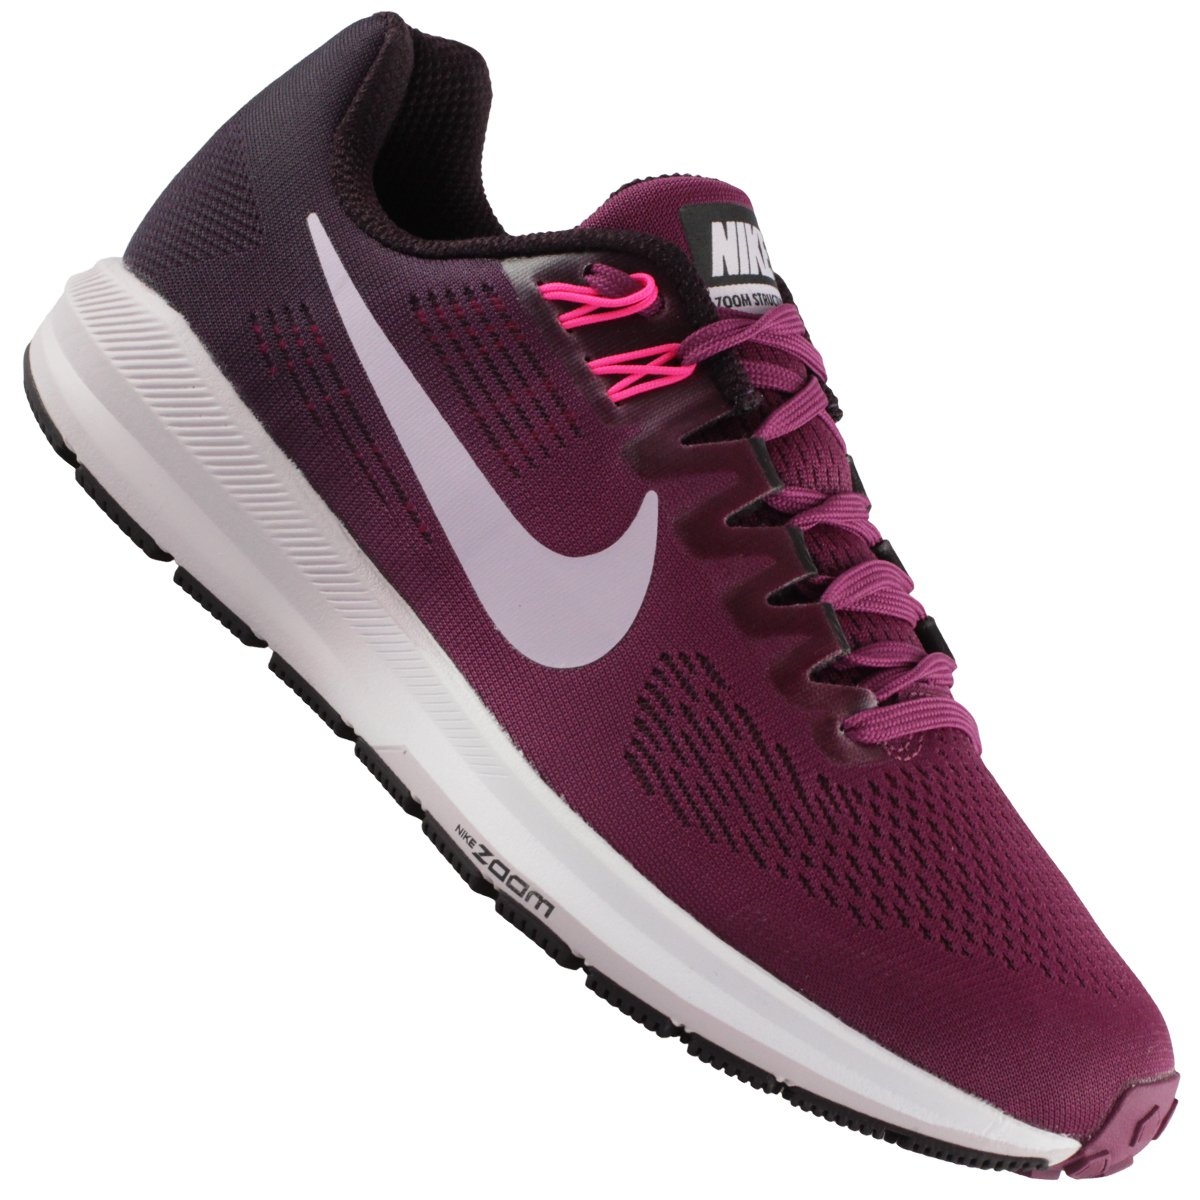 6bdcdc23e6e Tênis e Sapatos para Esportes - Treino e Corrida